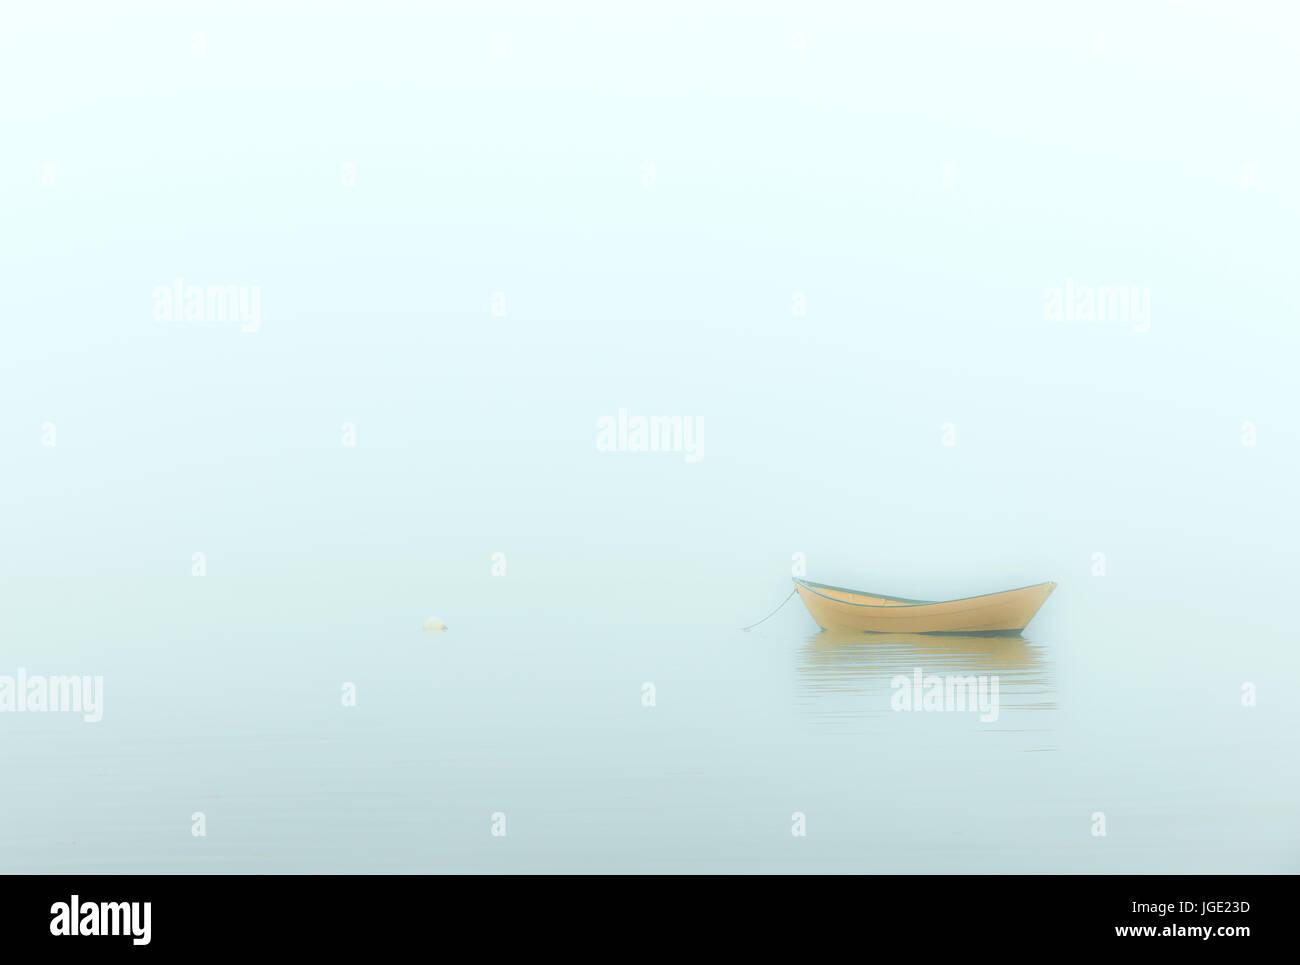 Einsamer Dory an einem bewölkten Morgen Brewster, Cape Cod, Massachusetts, USA. Stockbild